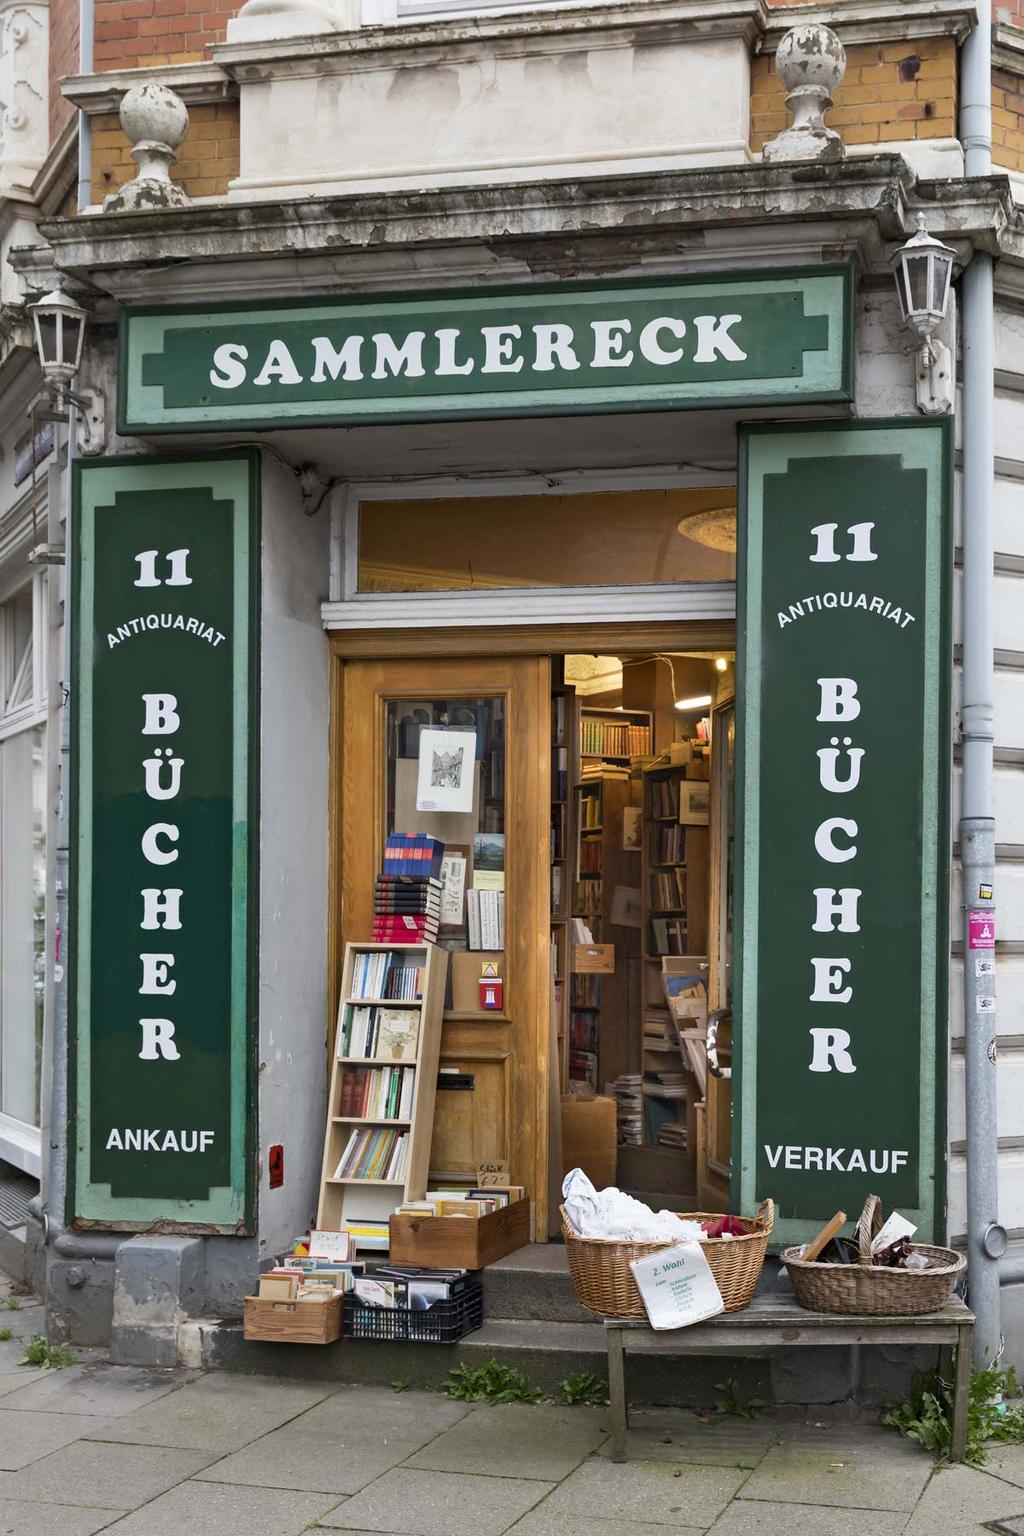 Boekenwinkel Sammlereck in Hamburg